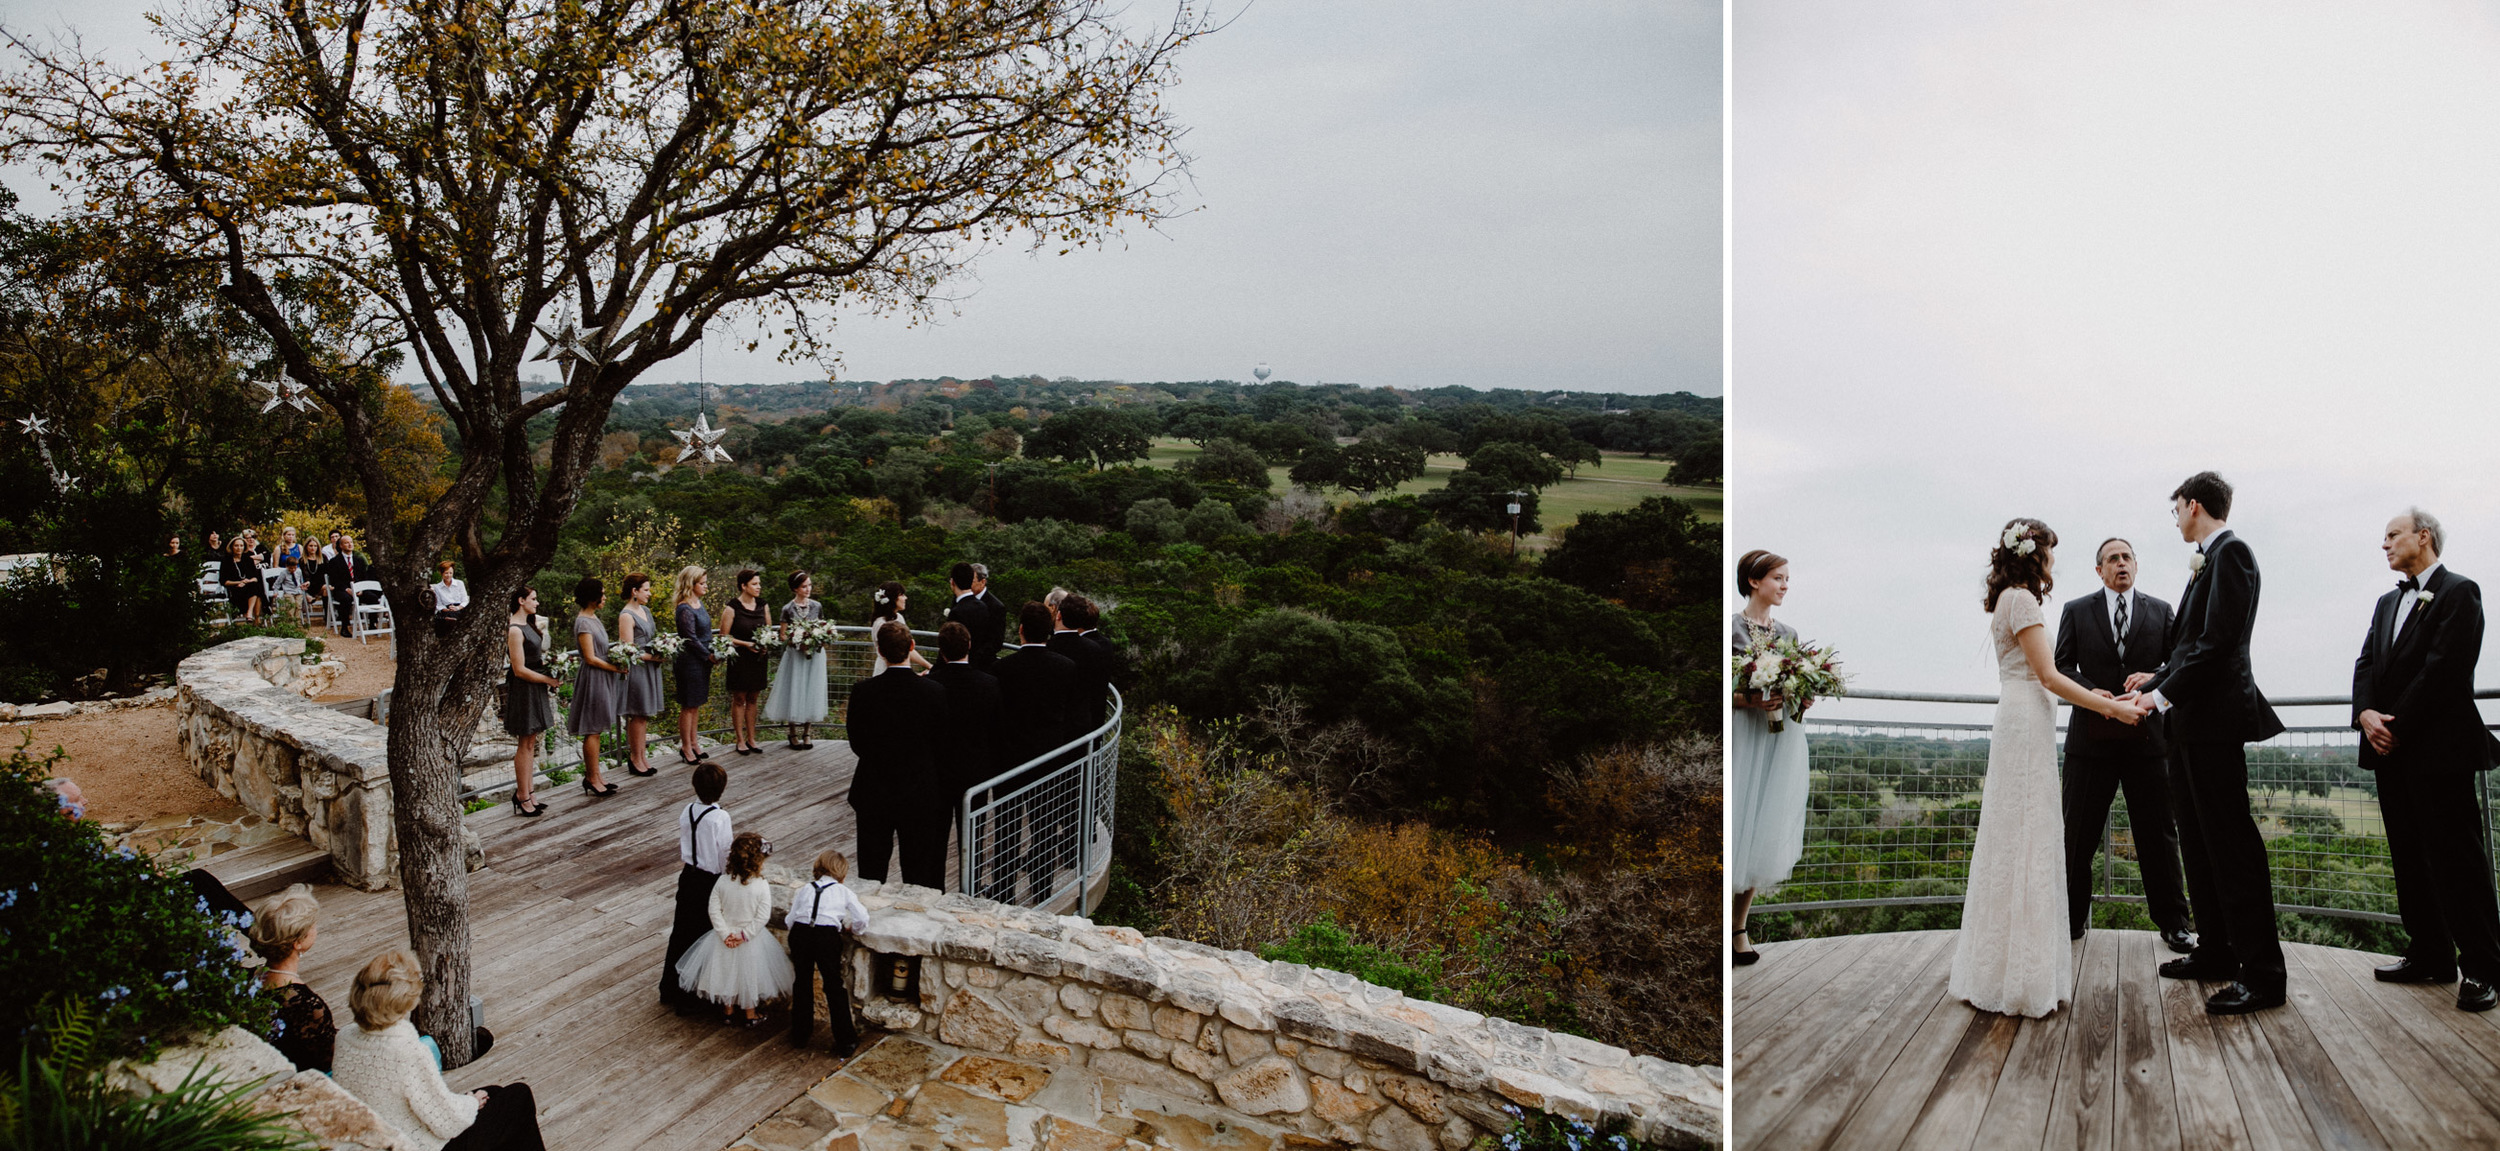 san antonio home wedding -3.jpg